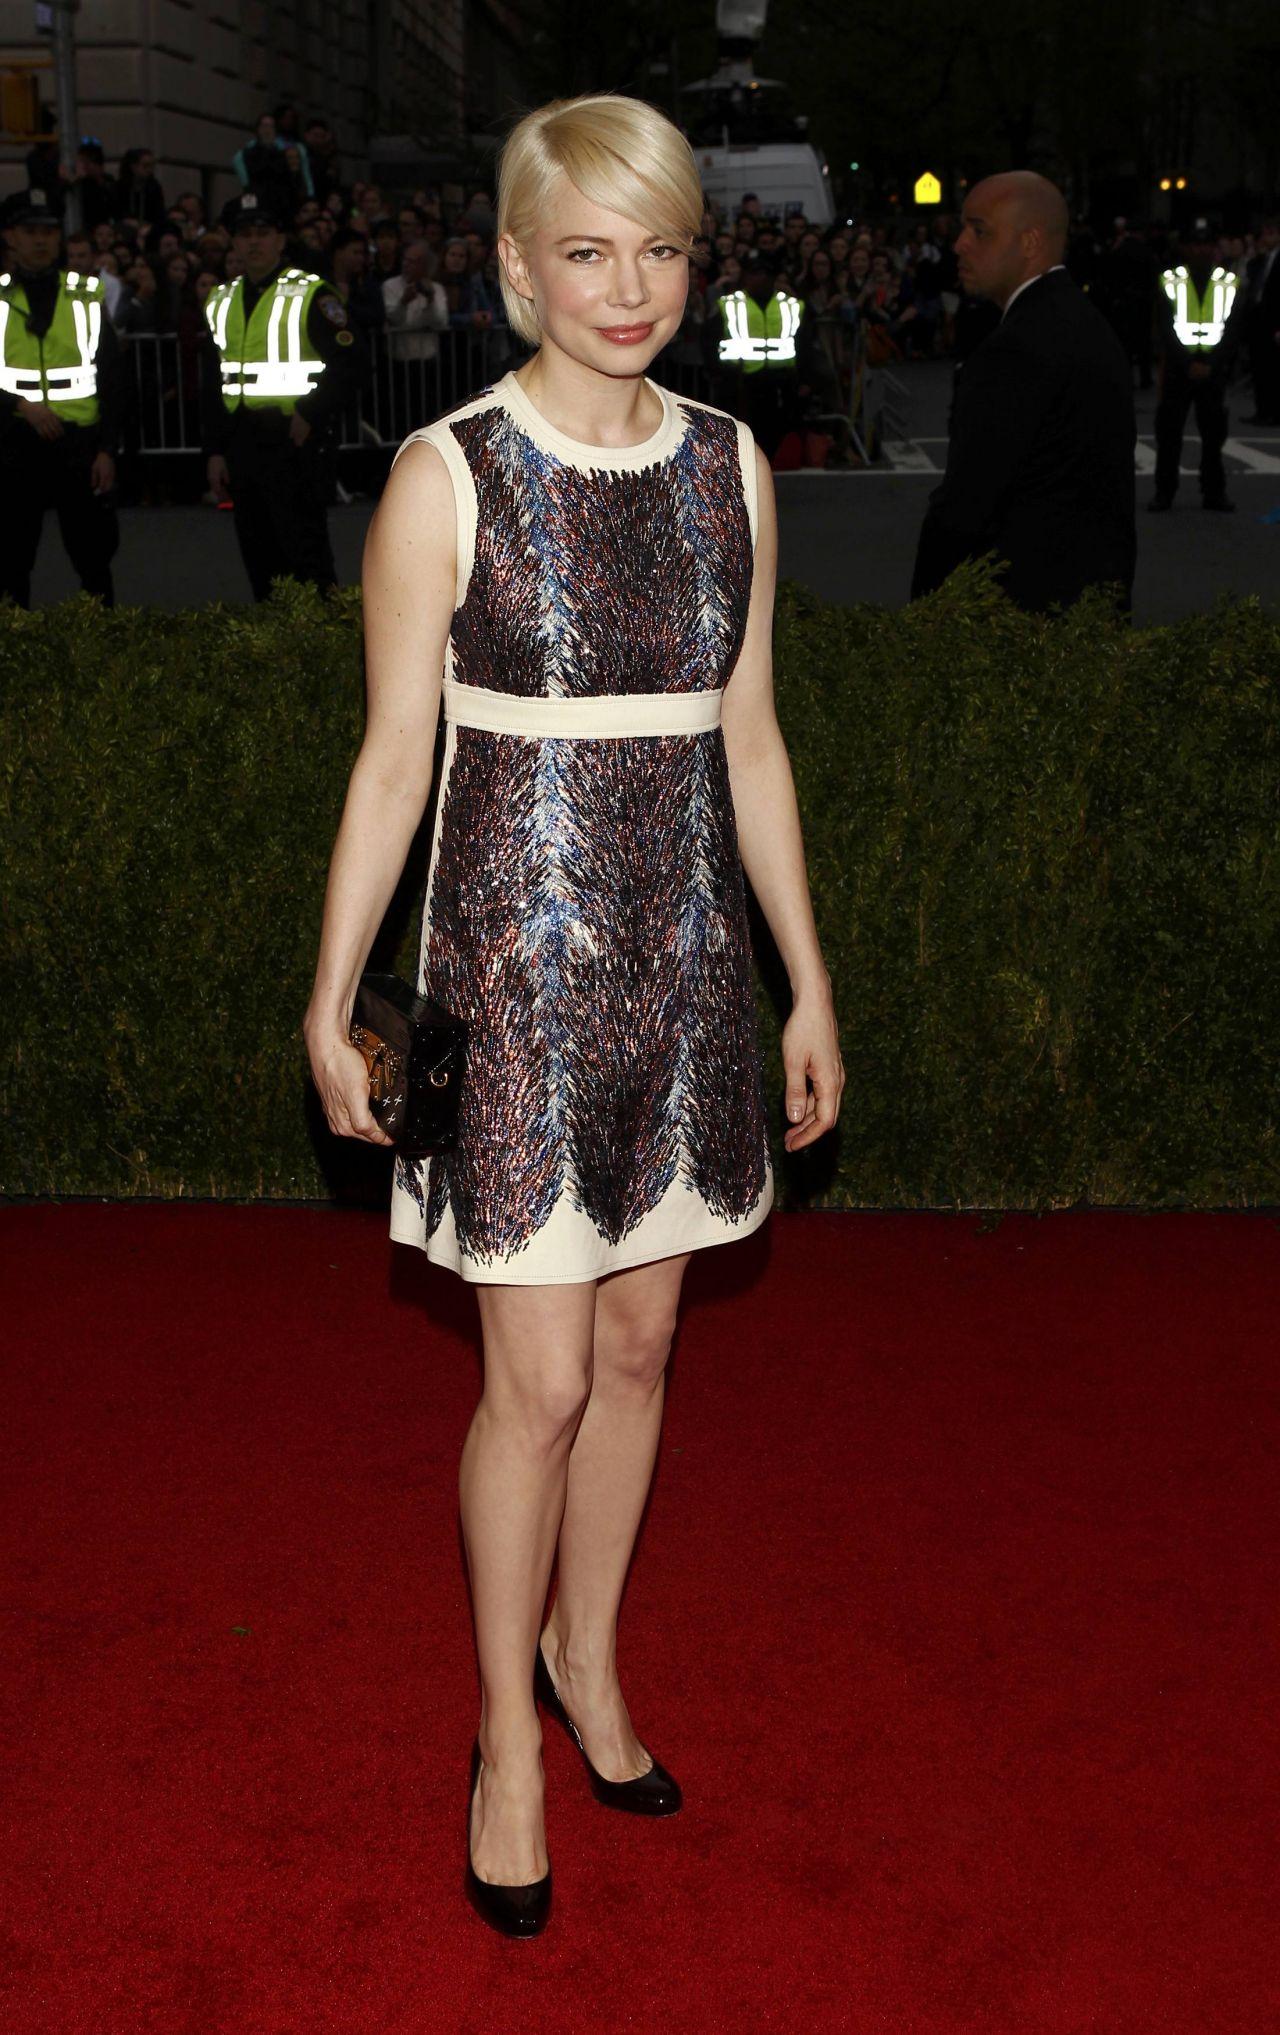 michelle williams in louis vuitton dress � 2014 met